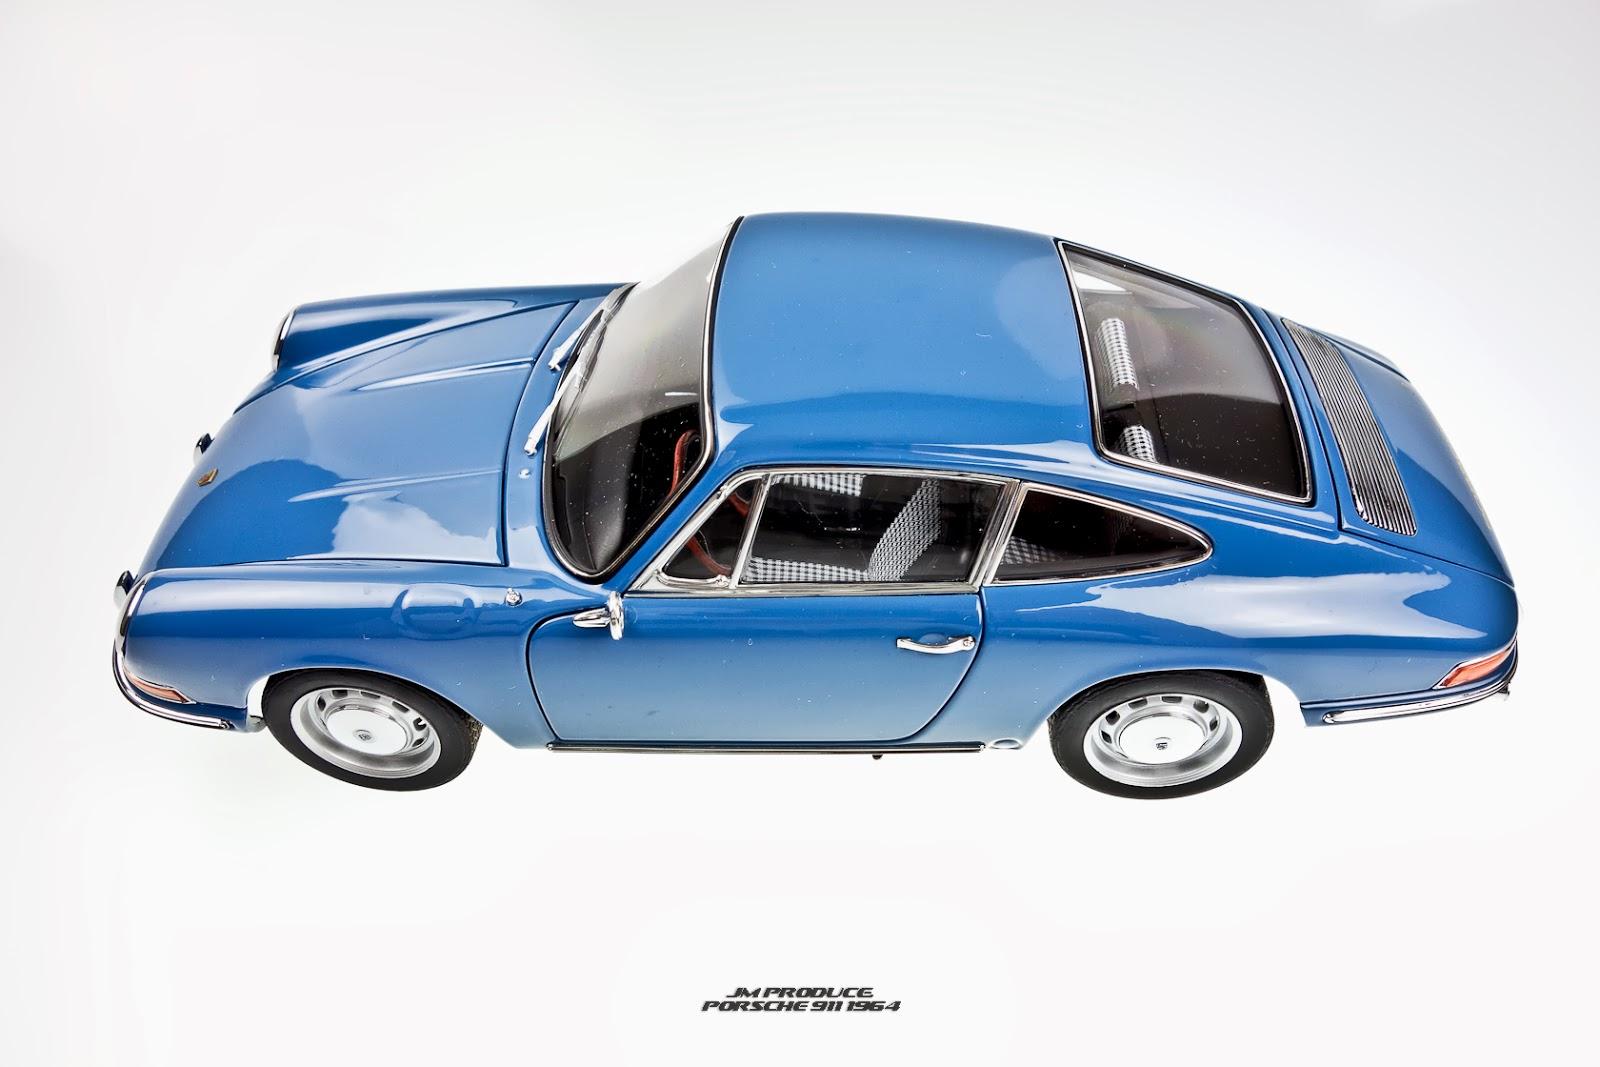 Porsche 911 1964 (Autoart 1:18) on dzhokhar tsarnaev porsche, who invented the porsche, alex porsche,